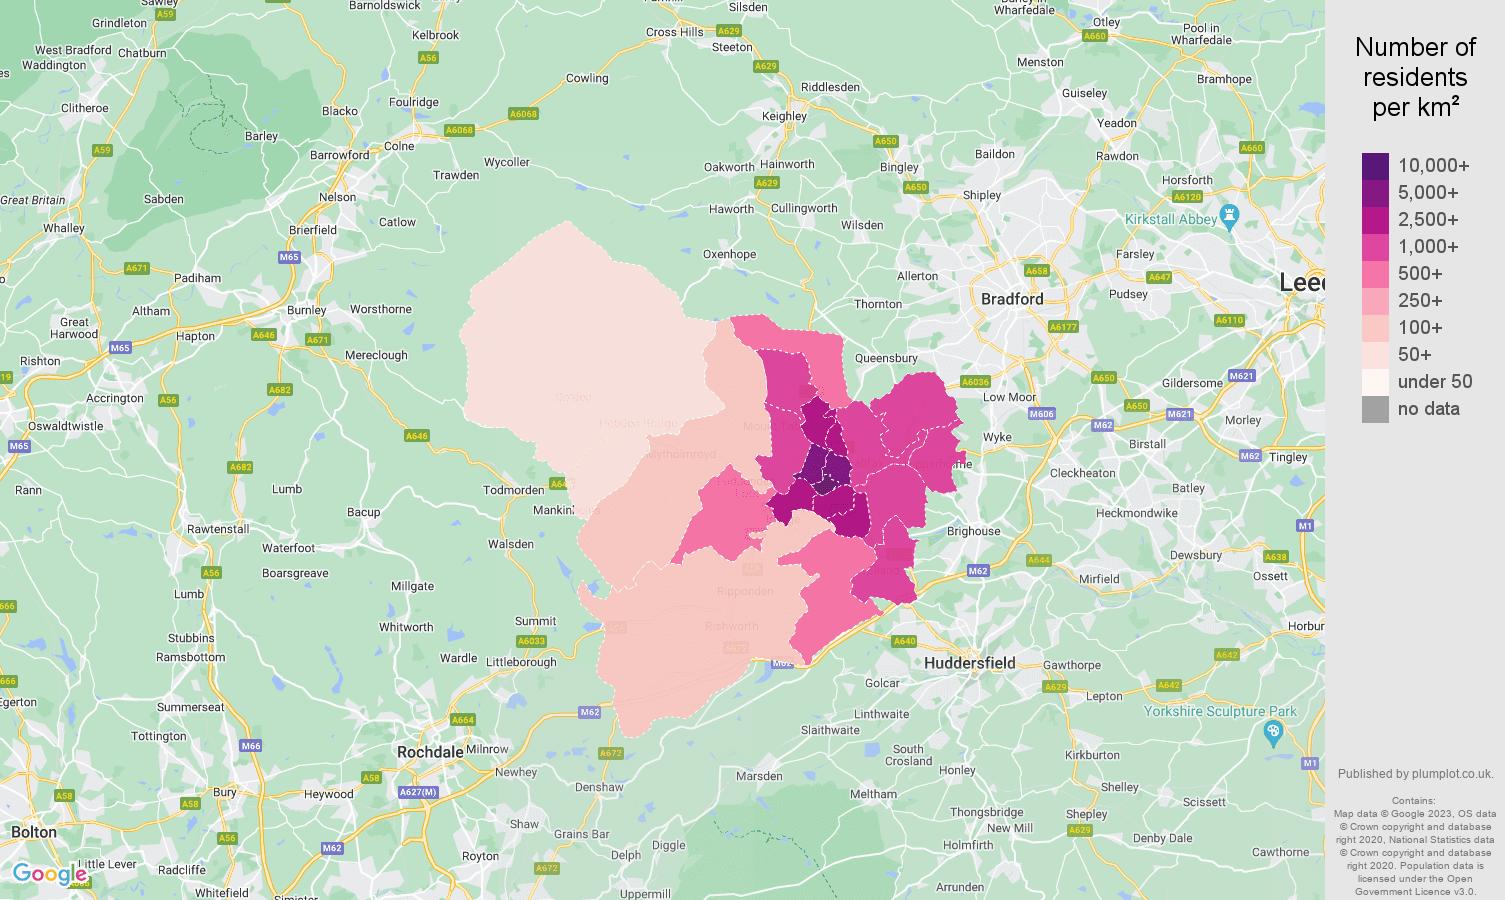 Halifax population density map